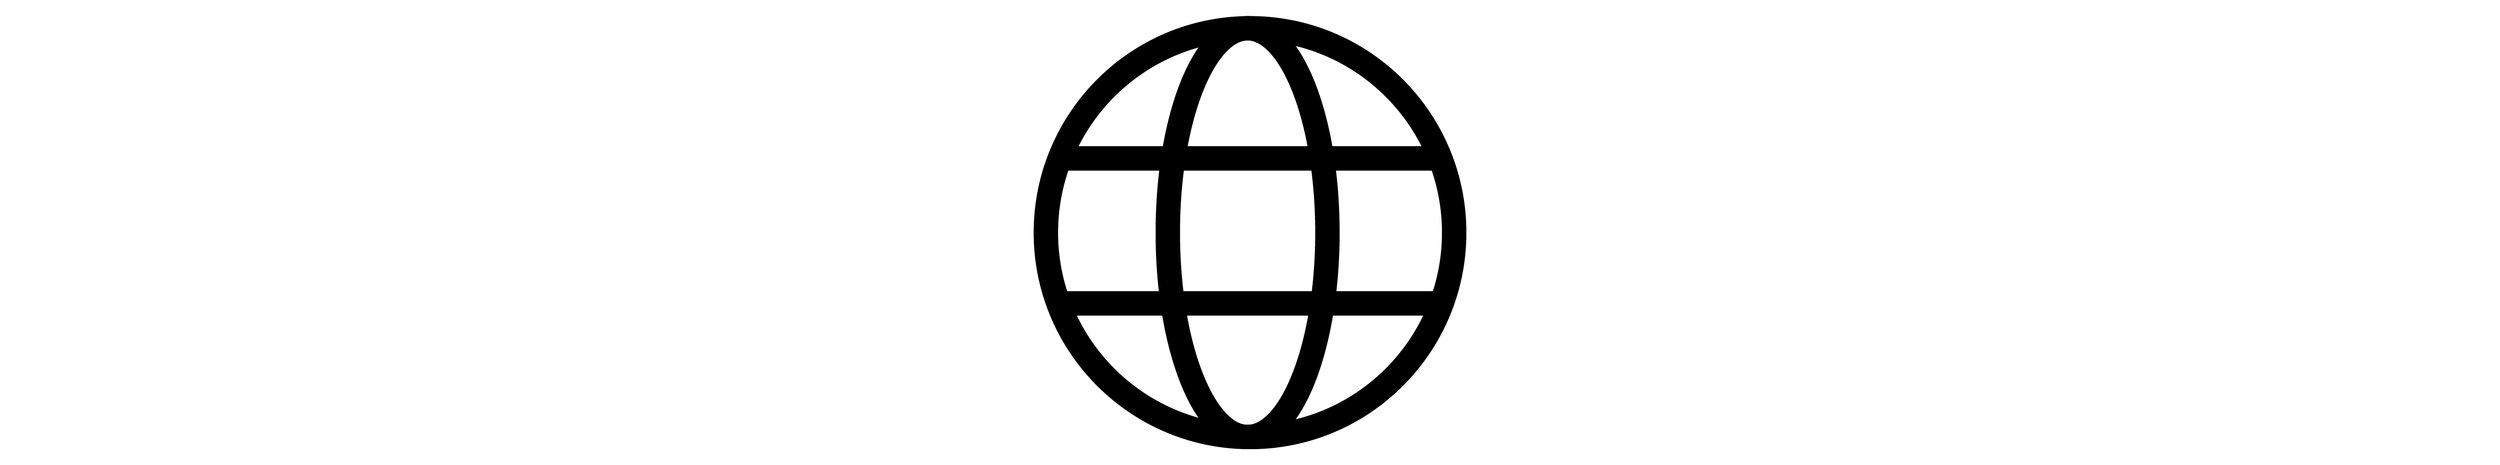 earthesswebsiteimagery_icons-04.jpg